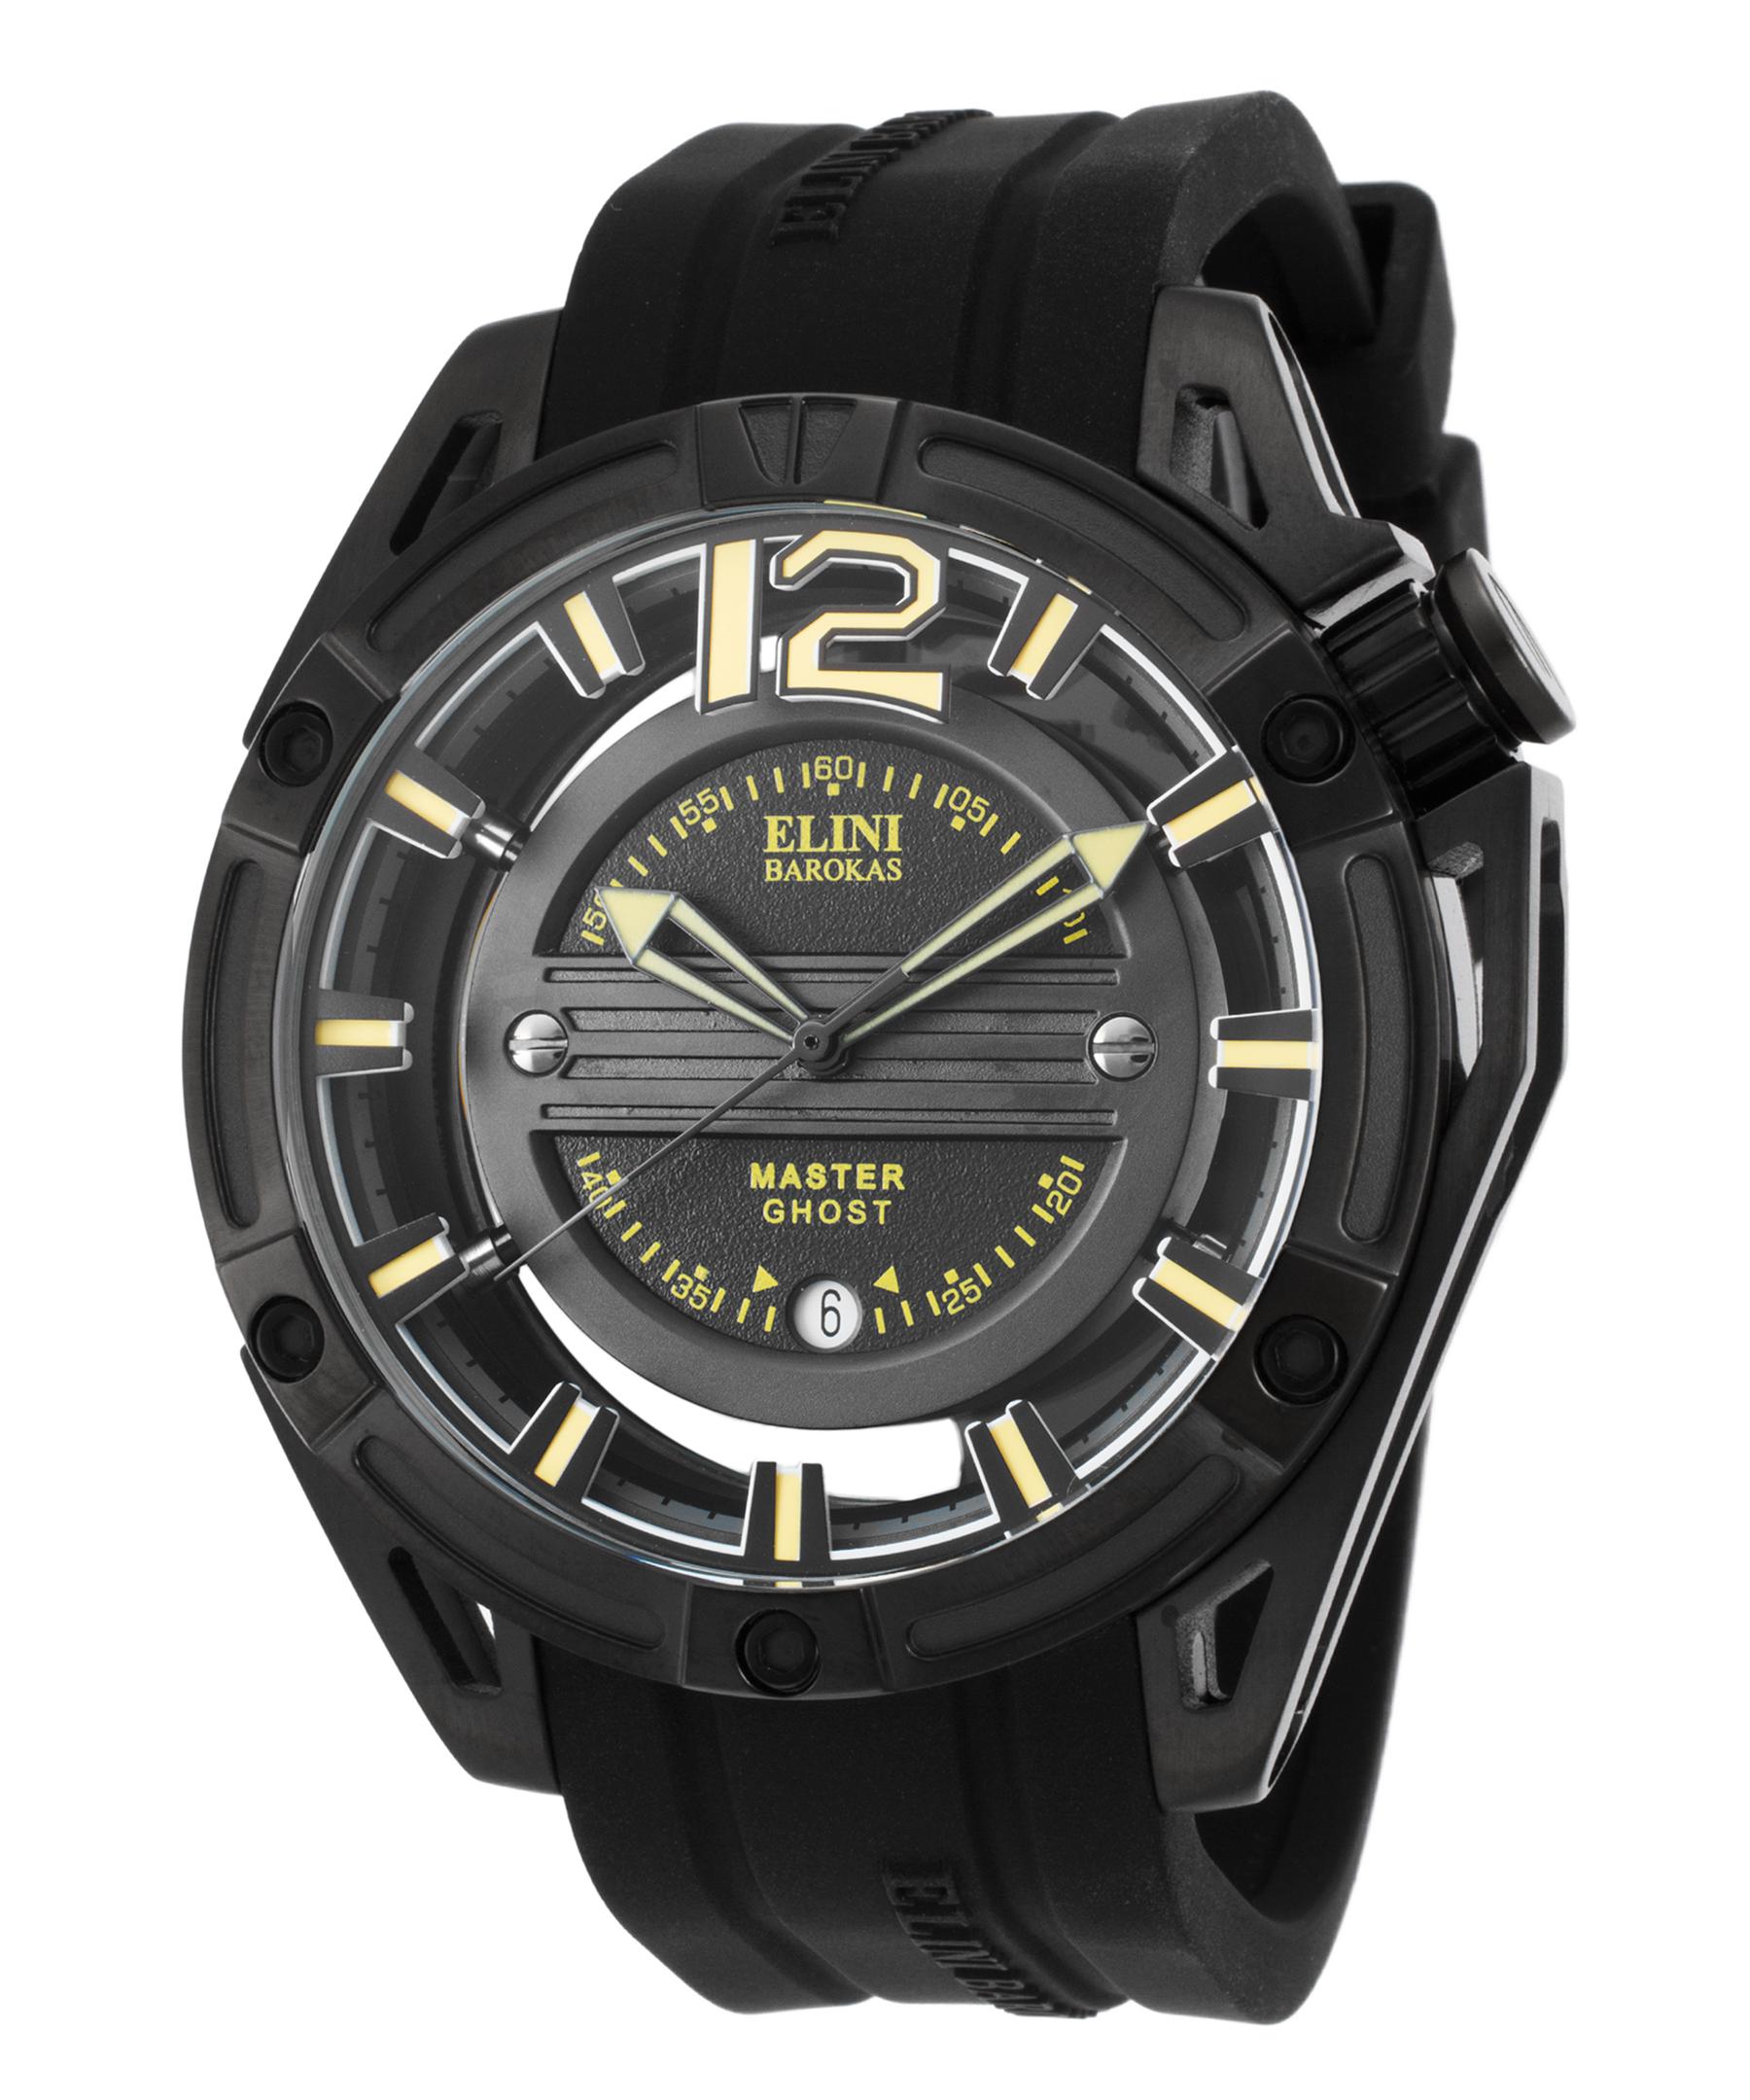 Elini Barokas 20016-Bb-01-Ya Master Ghost Black Silicone, Dial & Ion Plated Ss Ylw Accents Watch